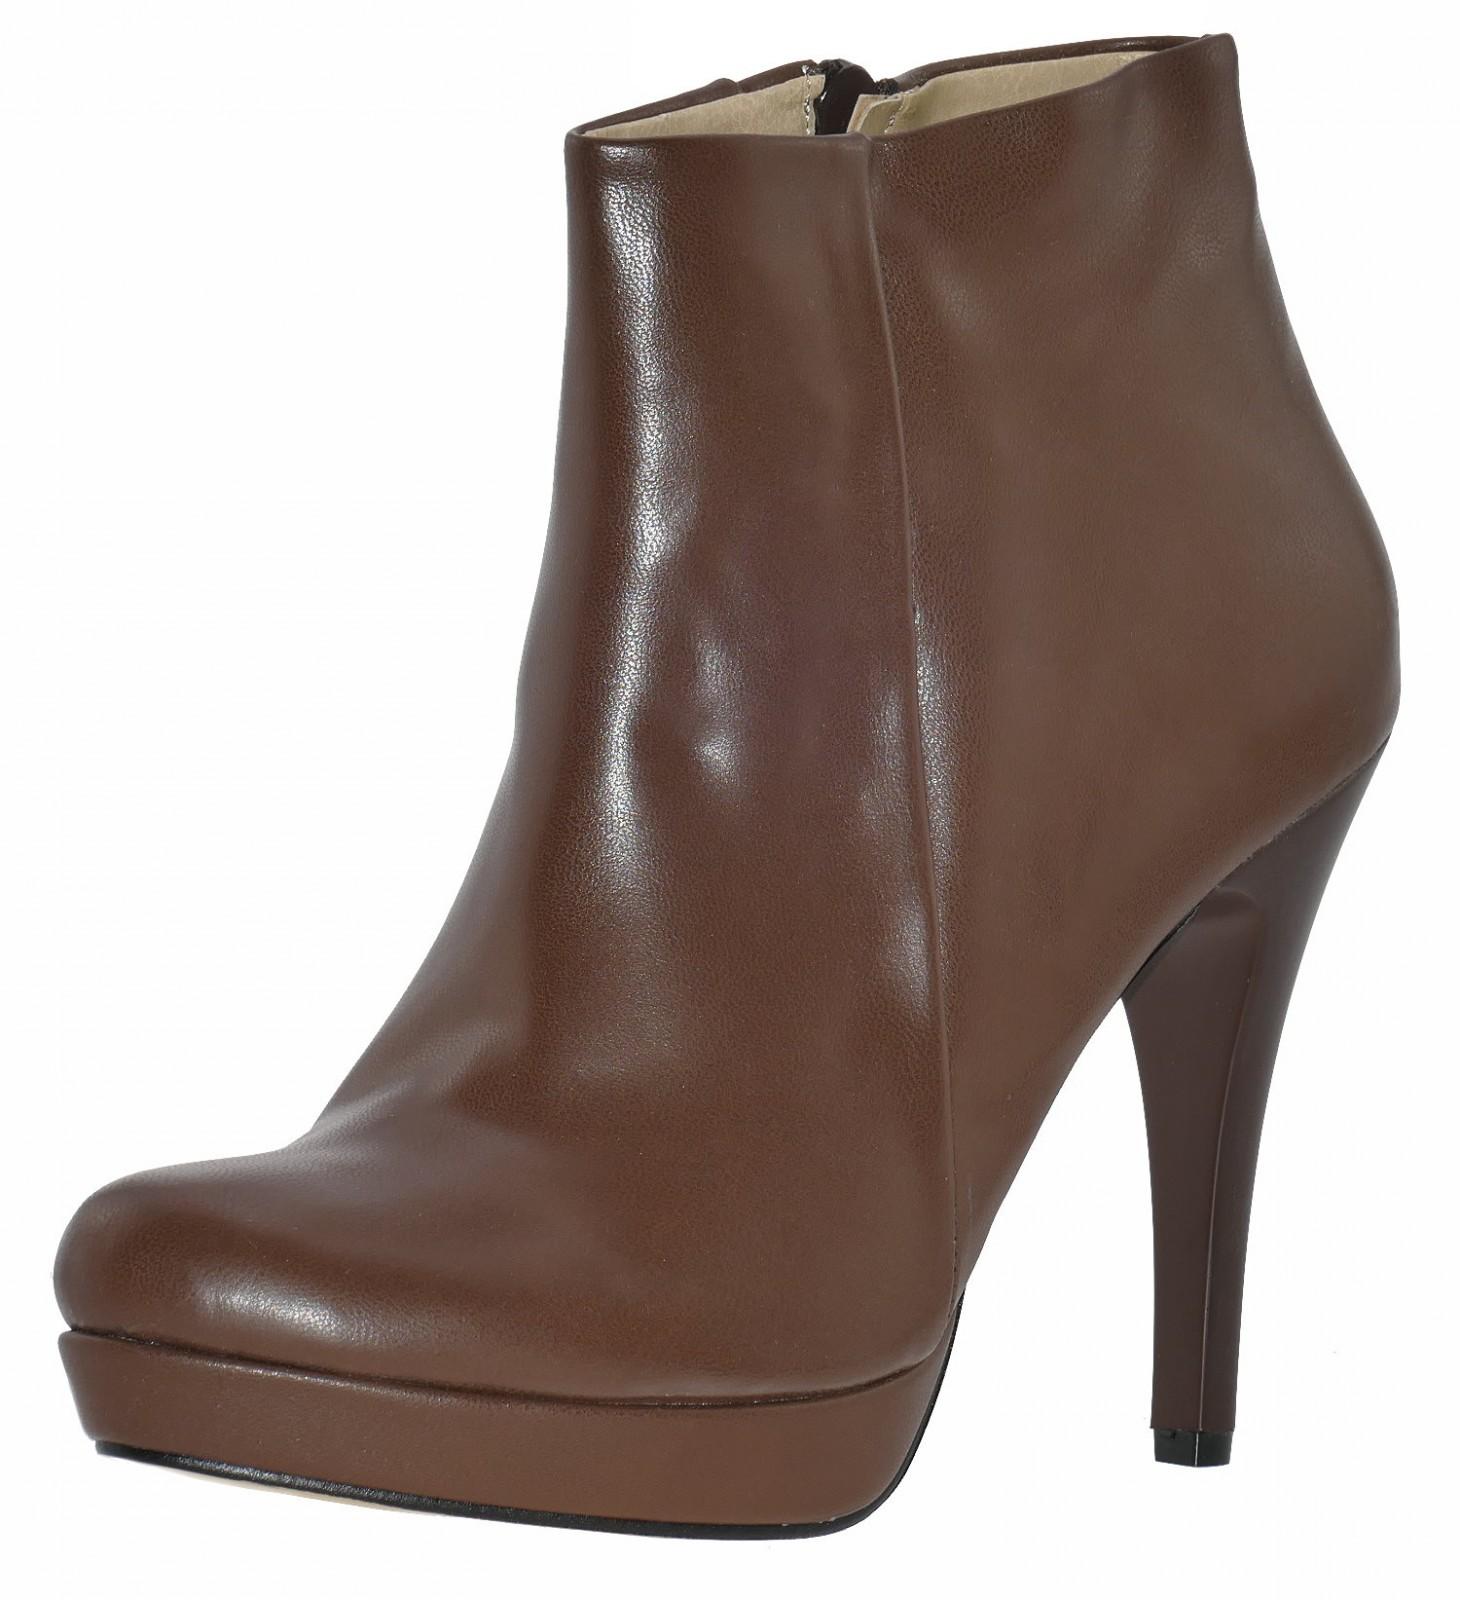 addonna 181093 plateau stiefeletten braun high heel. Black Bedroom Furniture Sets. Home Design Ideas